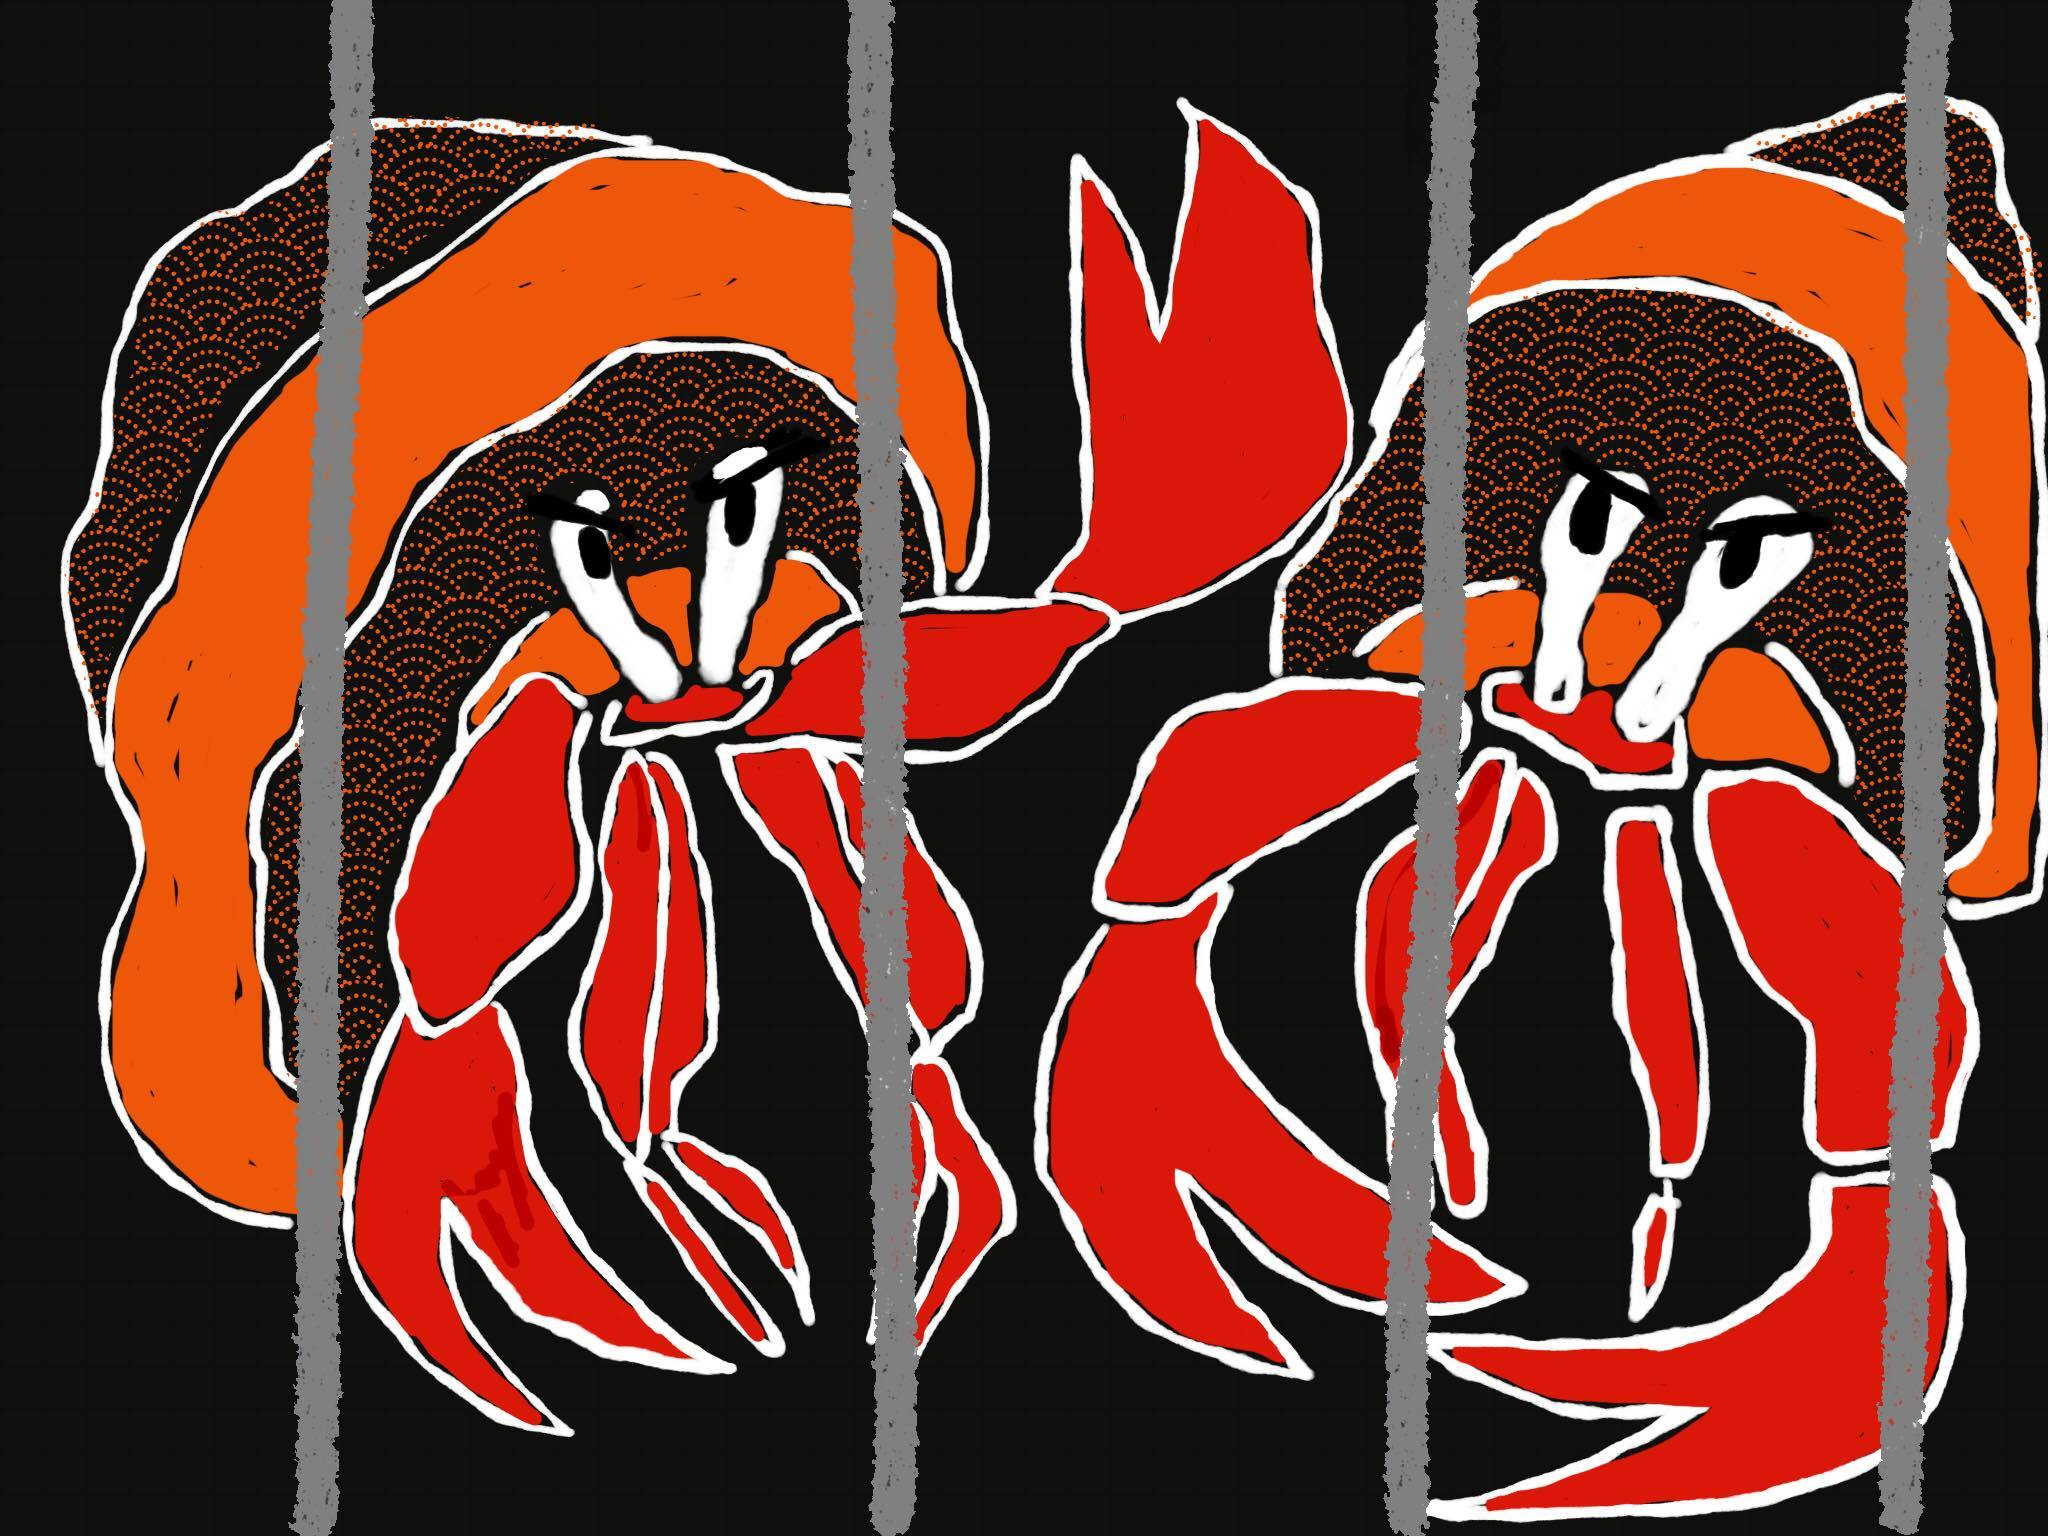 artwork inspired by  Evil Hermit Crabs , artist credit:Chilli Charlie